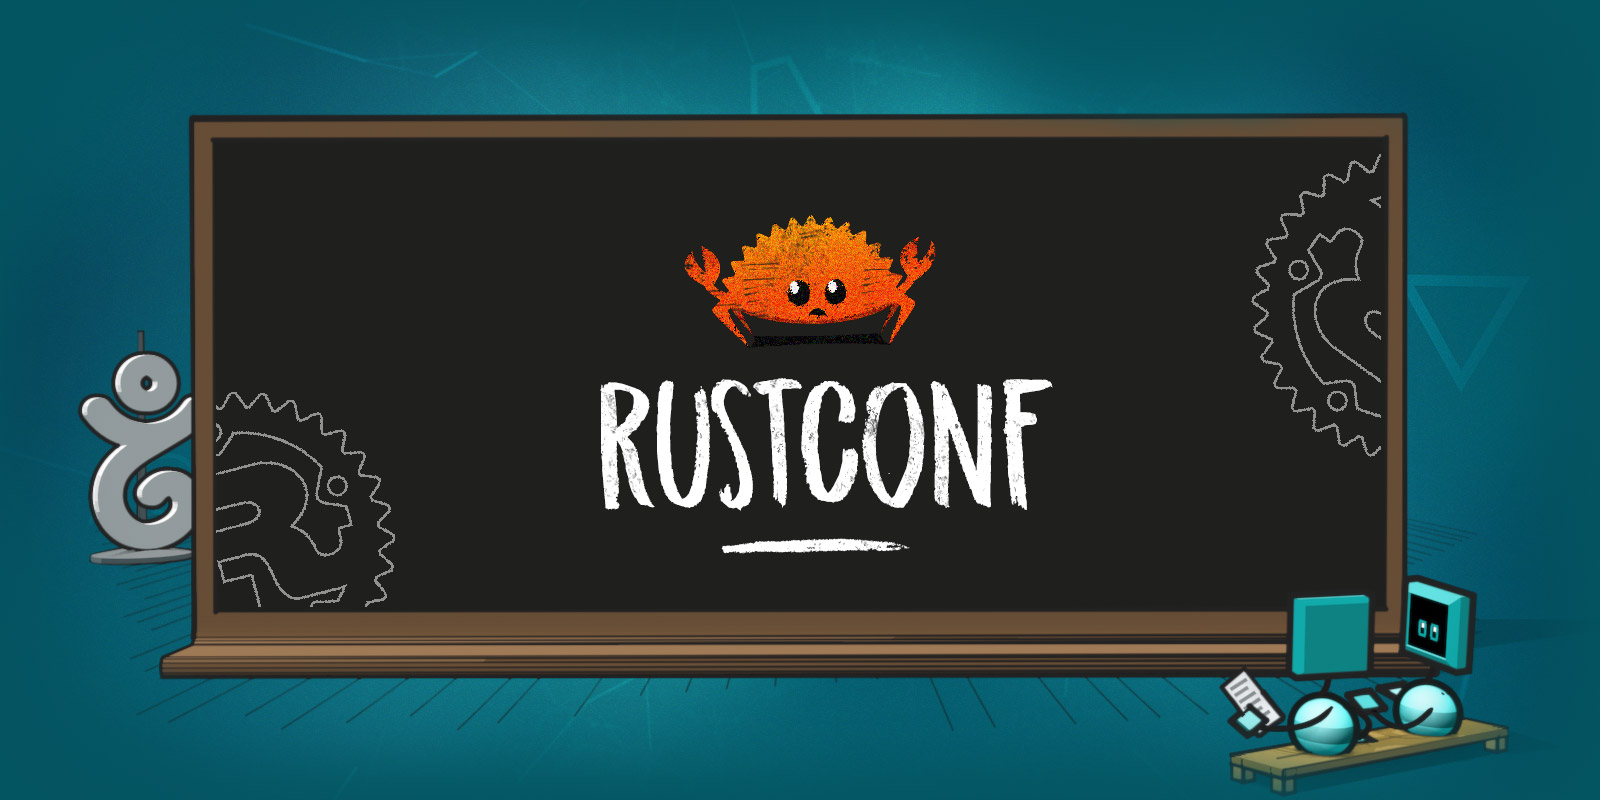 Gandi at Rustconf 2019